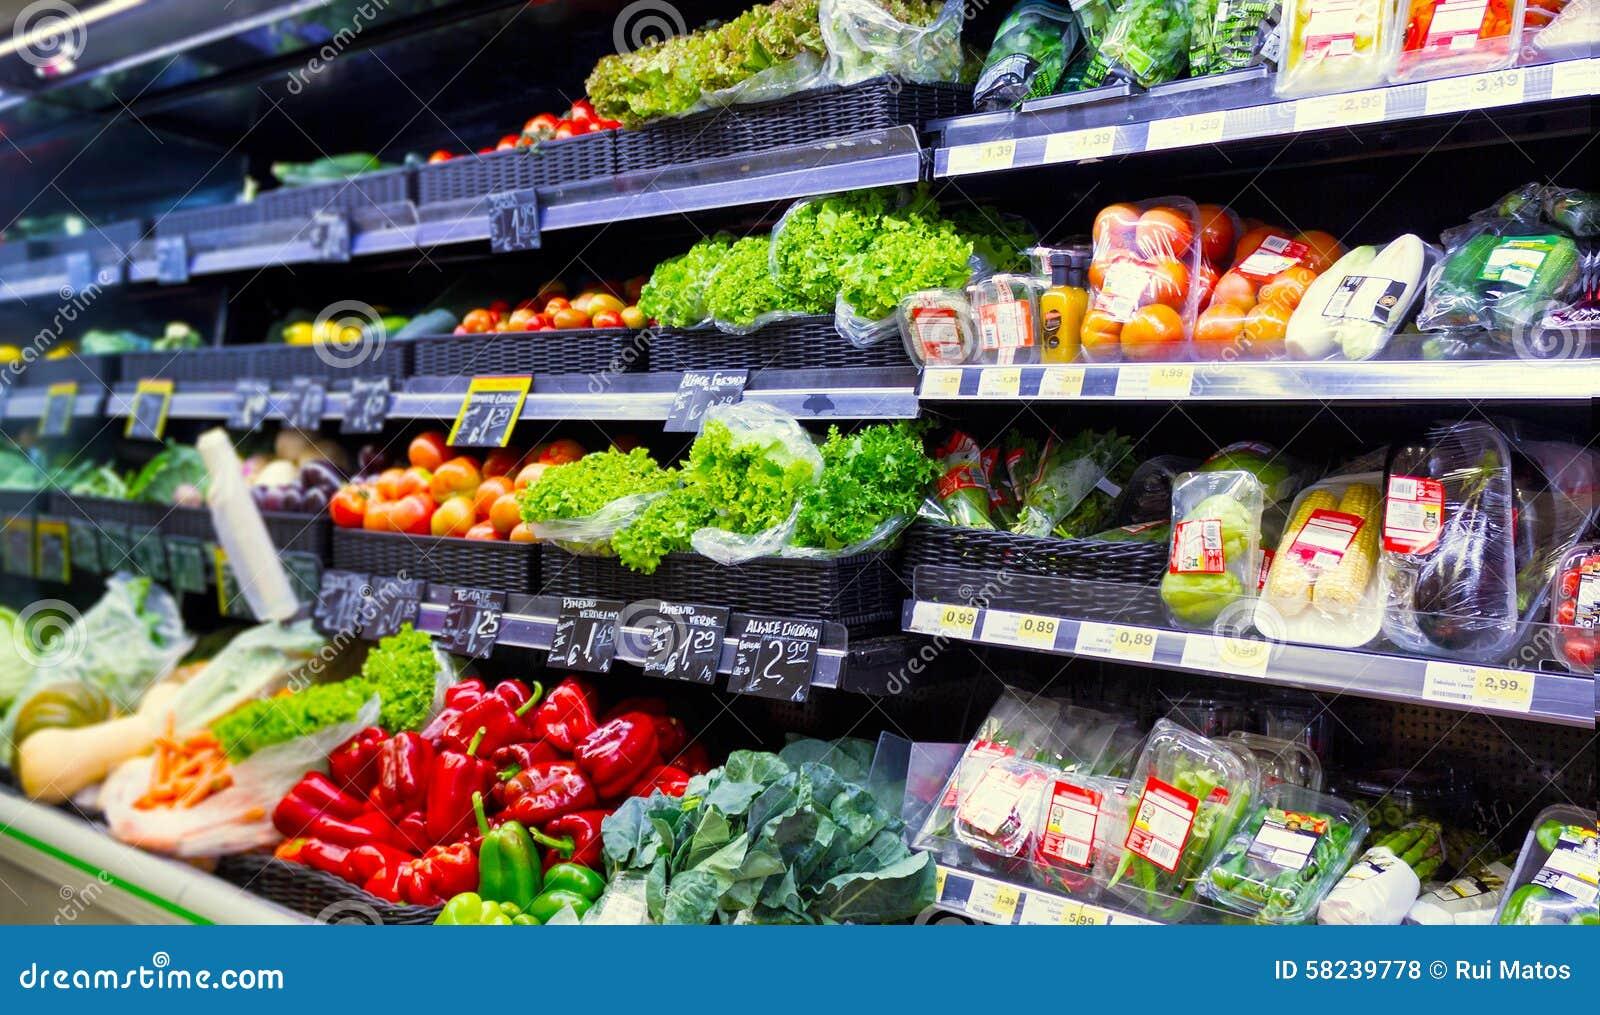 Vegetables at the supermarket